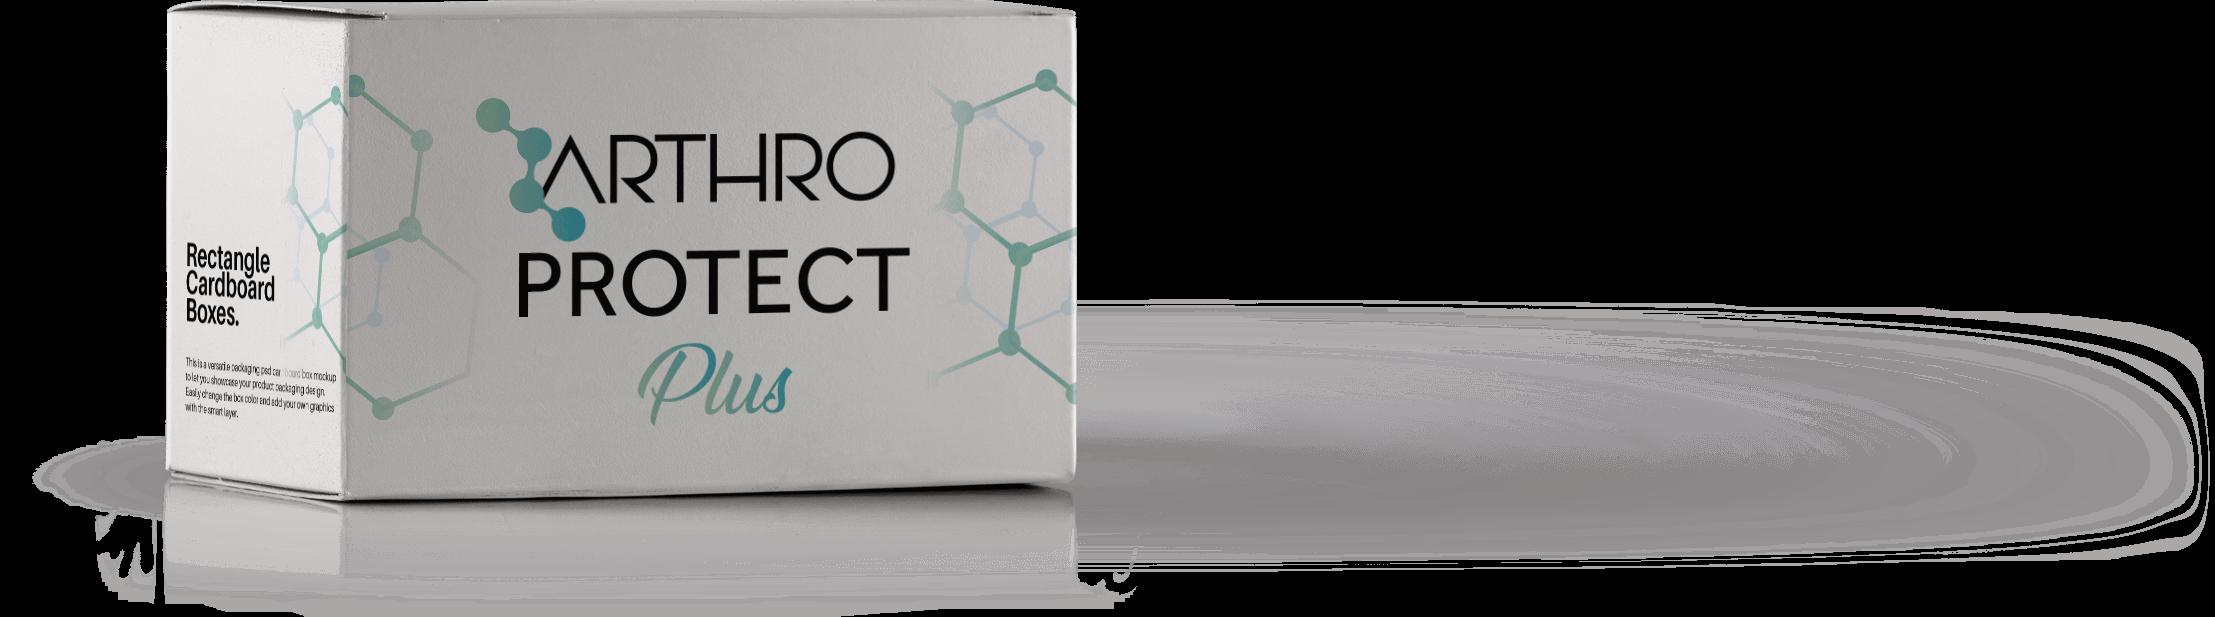 Producto Arthro Protect Plus